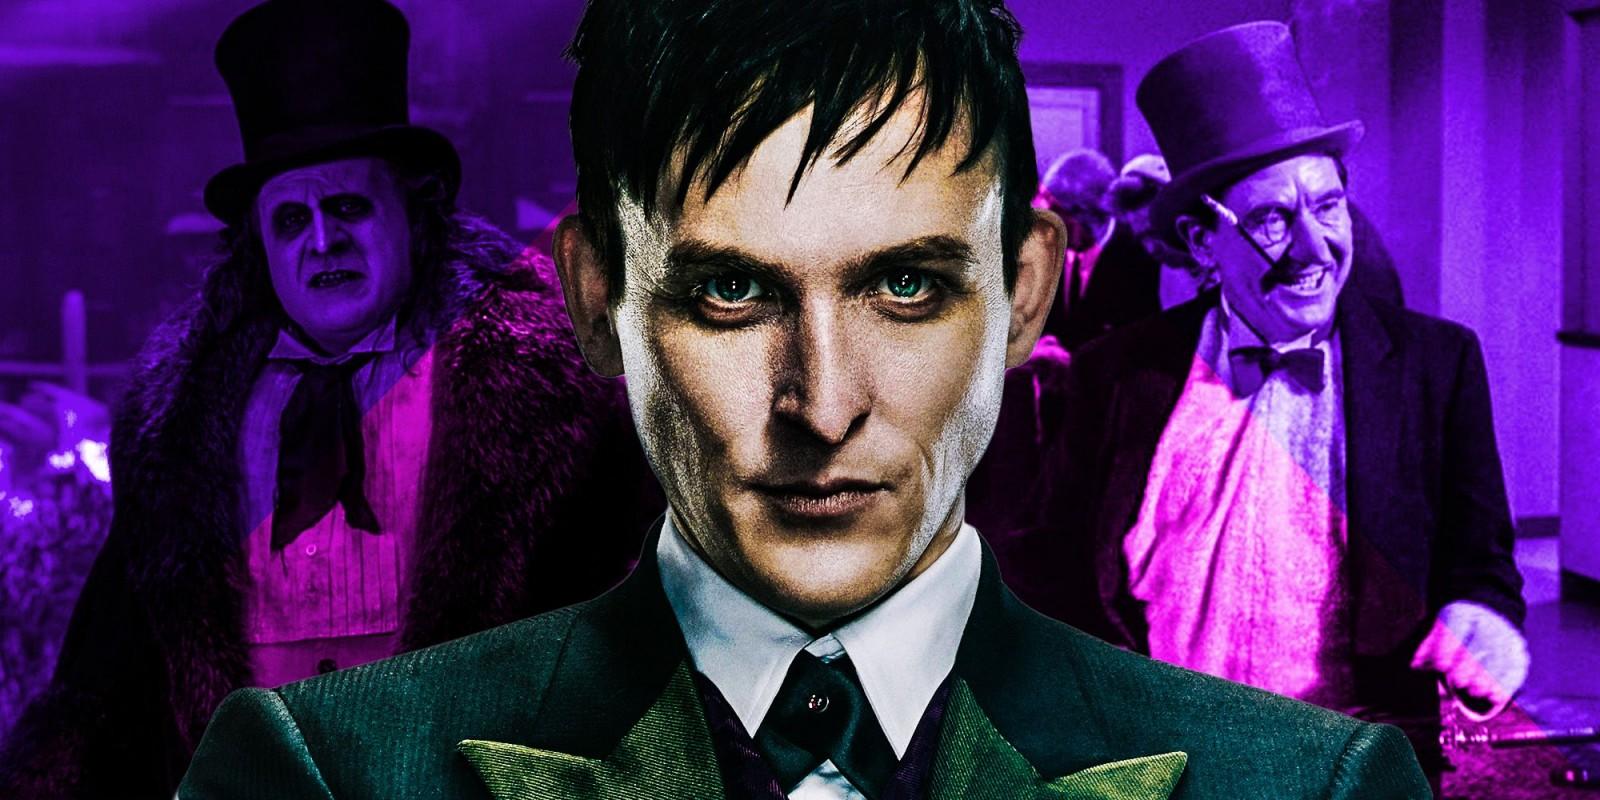 Live-action-Penguin-actors-danny-devito-burgess-meredith-Robin-lord-taylor